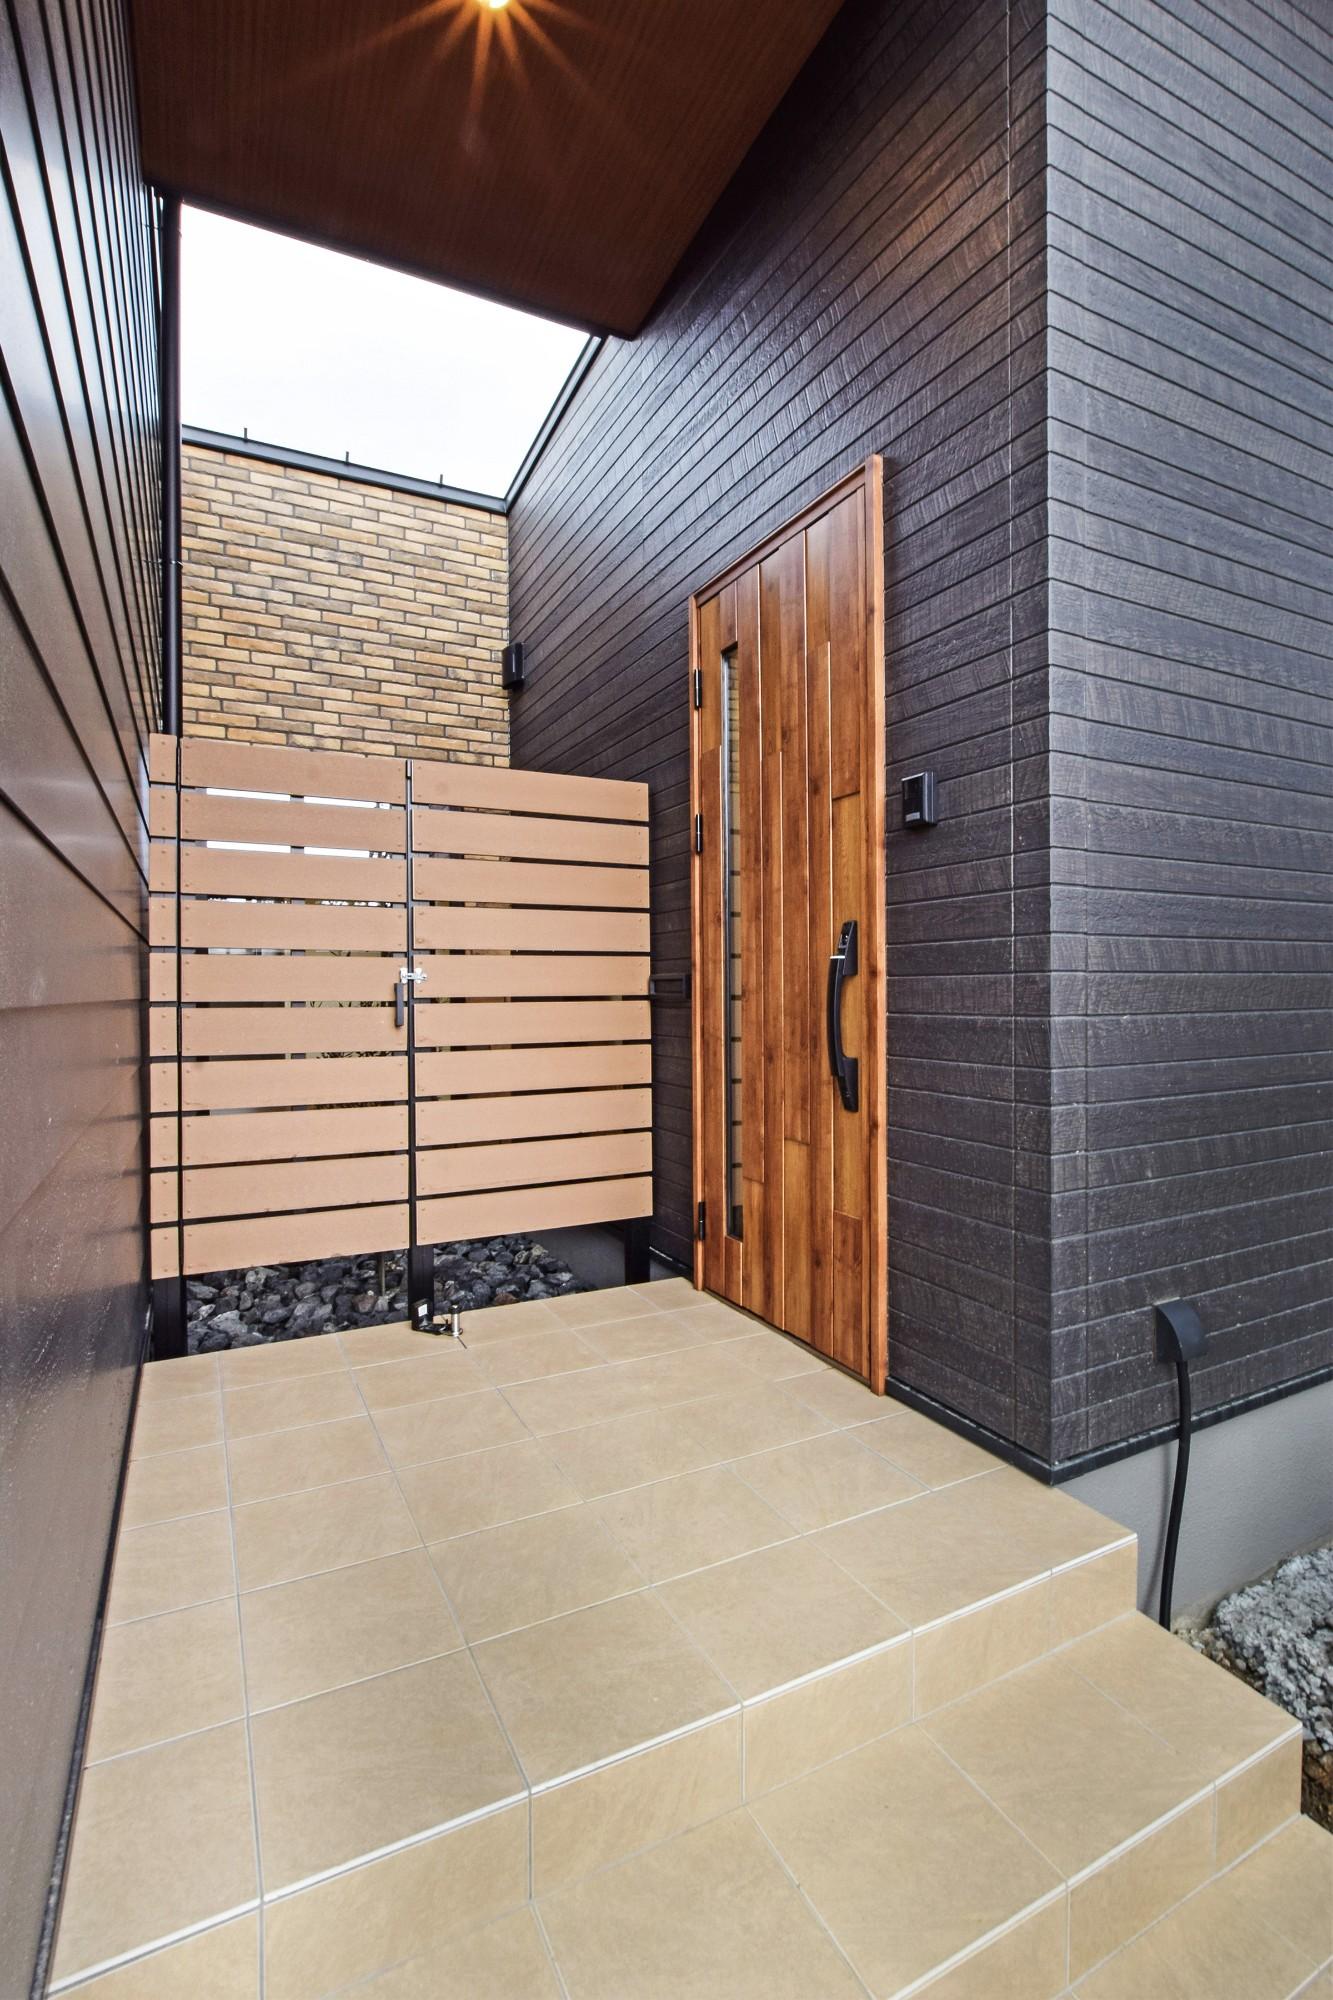 DETAIL HOME(ディテールホーム)「ペットと共生する三世代同居の平屋住宅」のシンプル・ナチュラルなポーチの実例写真